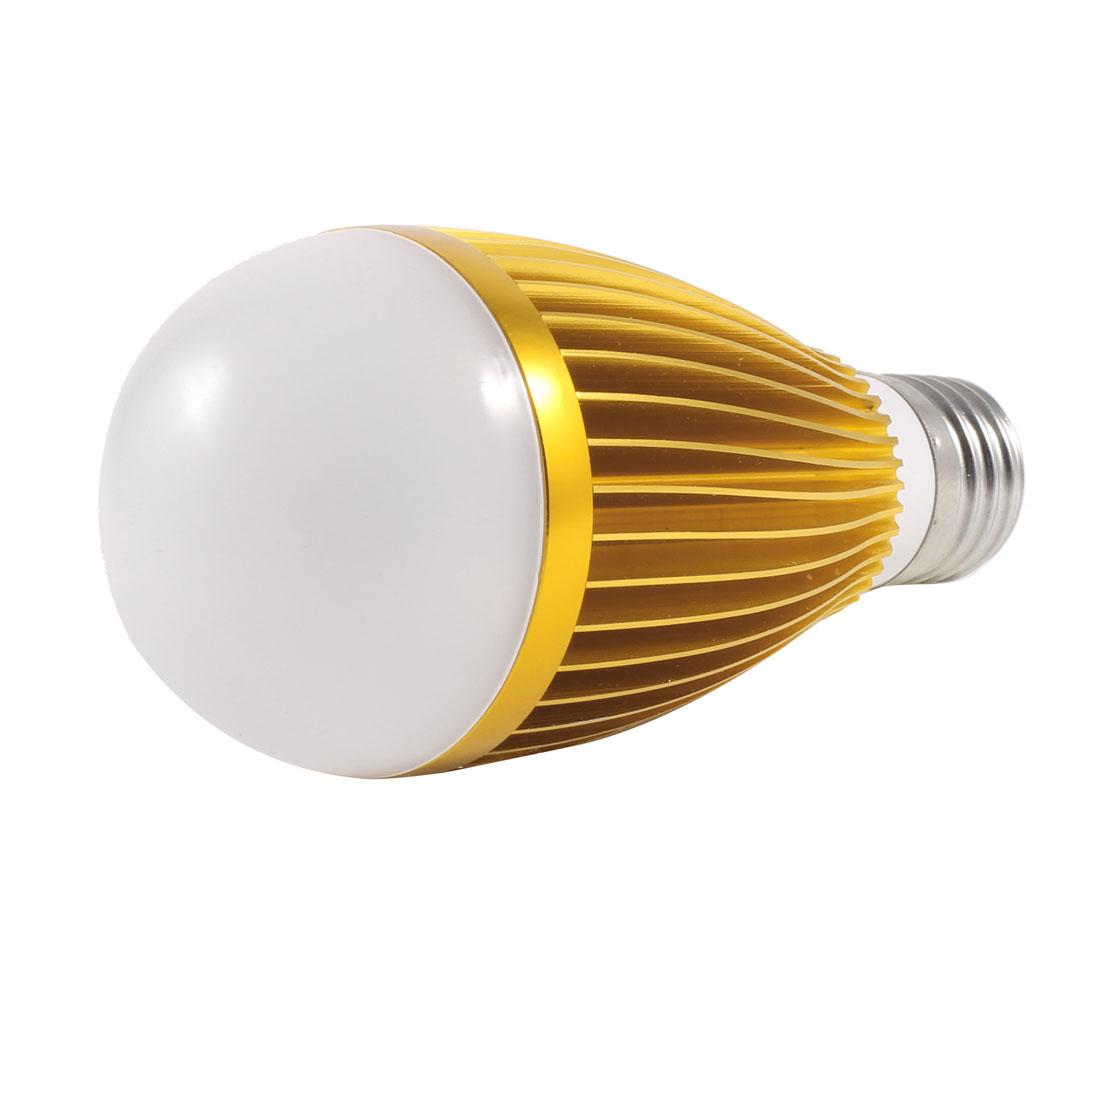 Gold Tone Housing E27 Socket White LED Light Ball Bulb Lamp 7W AC 220V